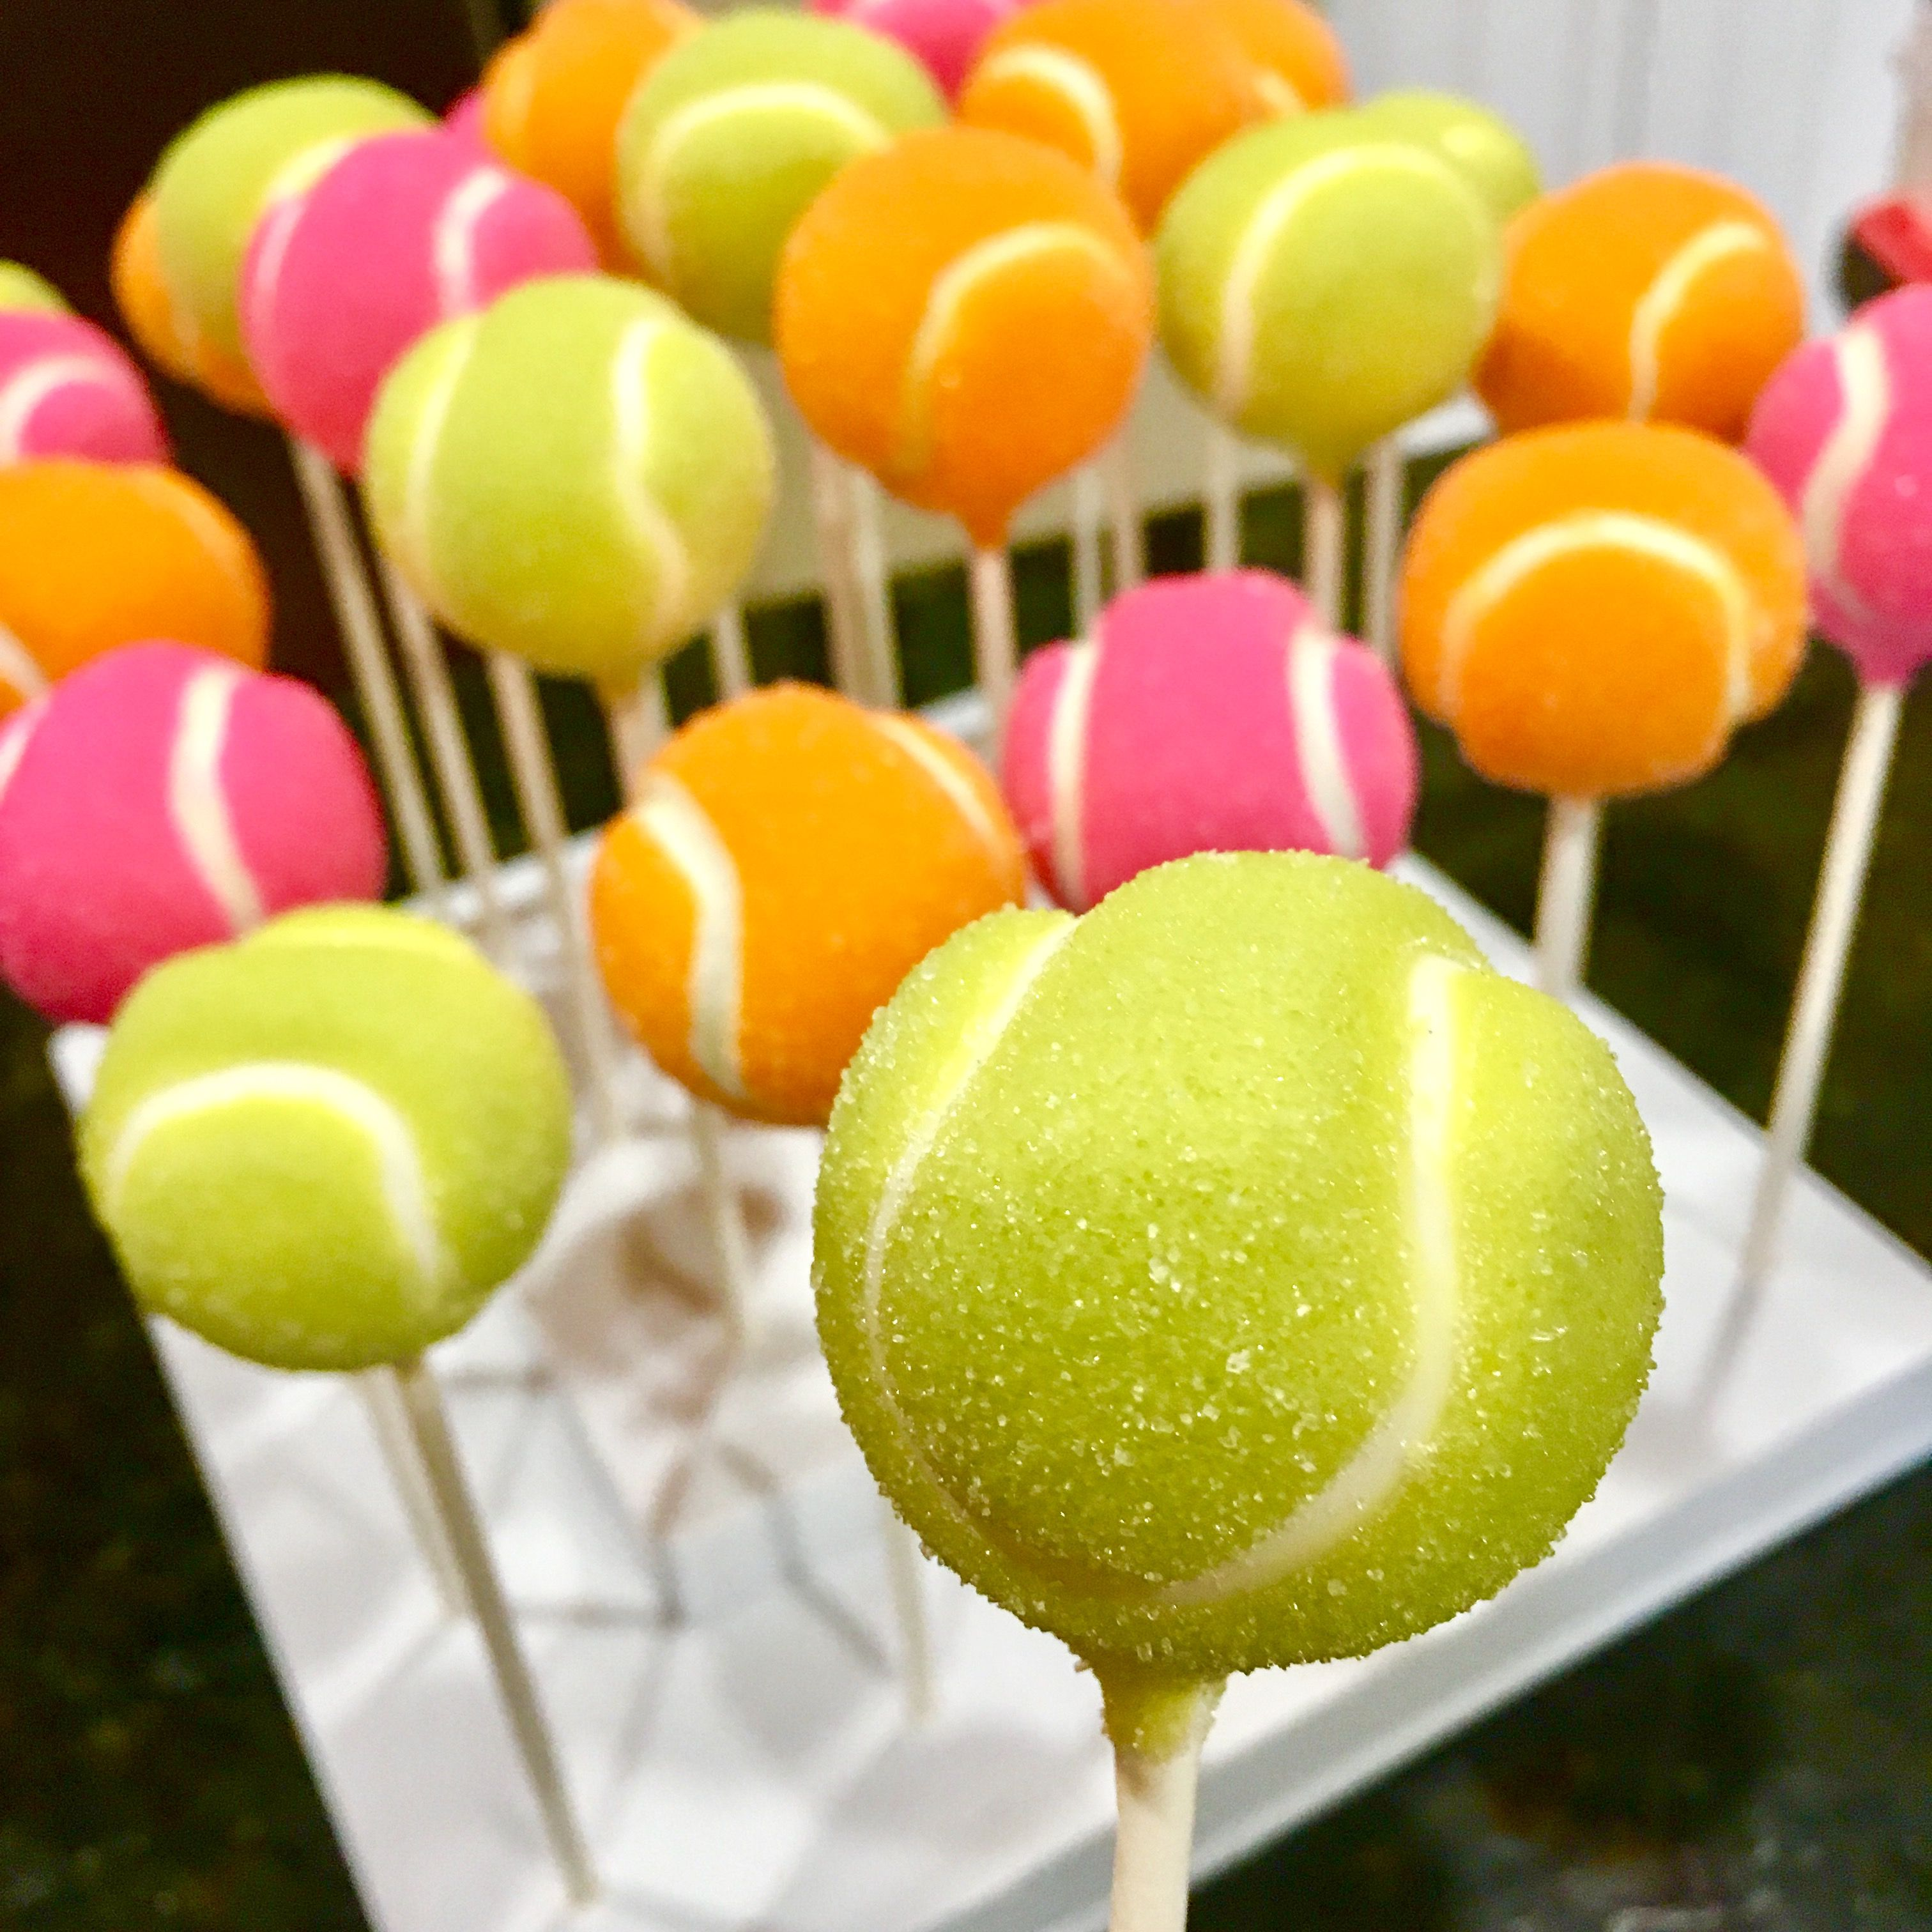 Tennis ball cake pops cake pops balls all occasions pinterest geburtstag torte torten and - Cake pops 50 geburtstag ...